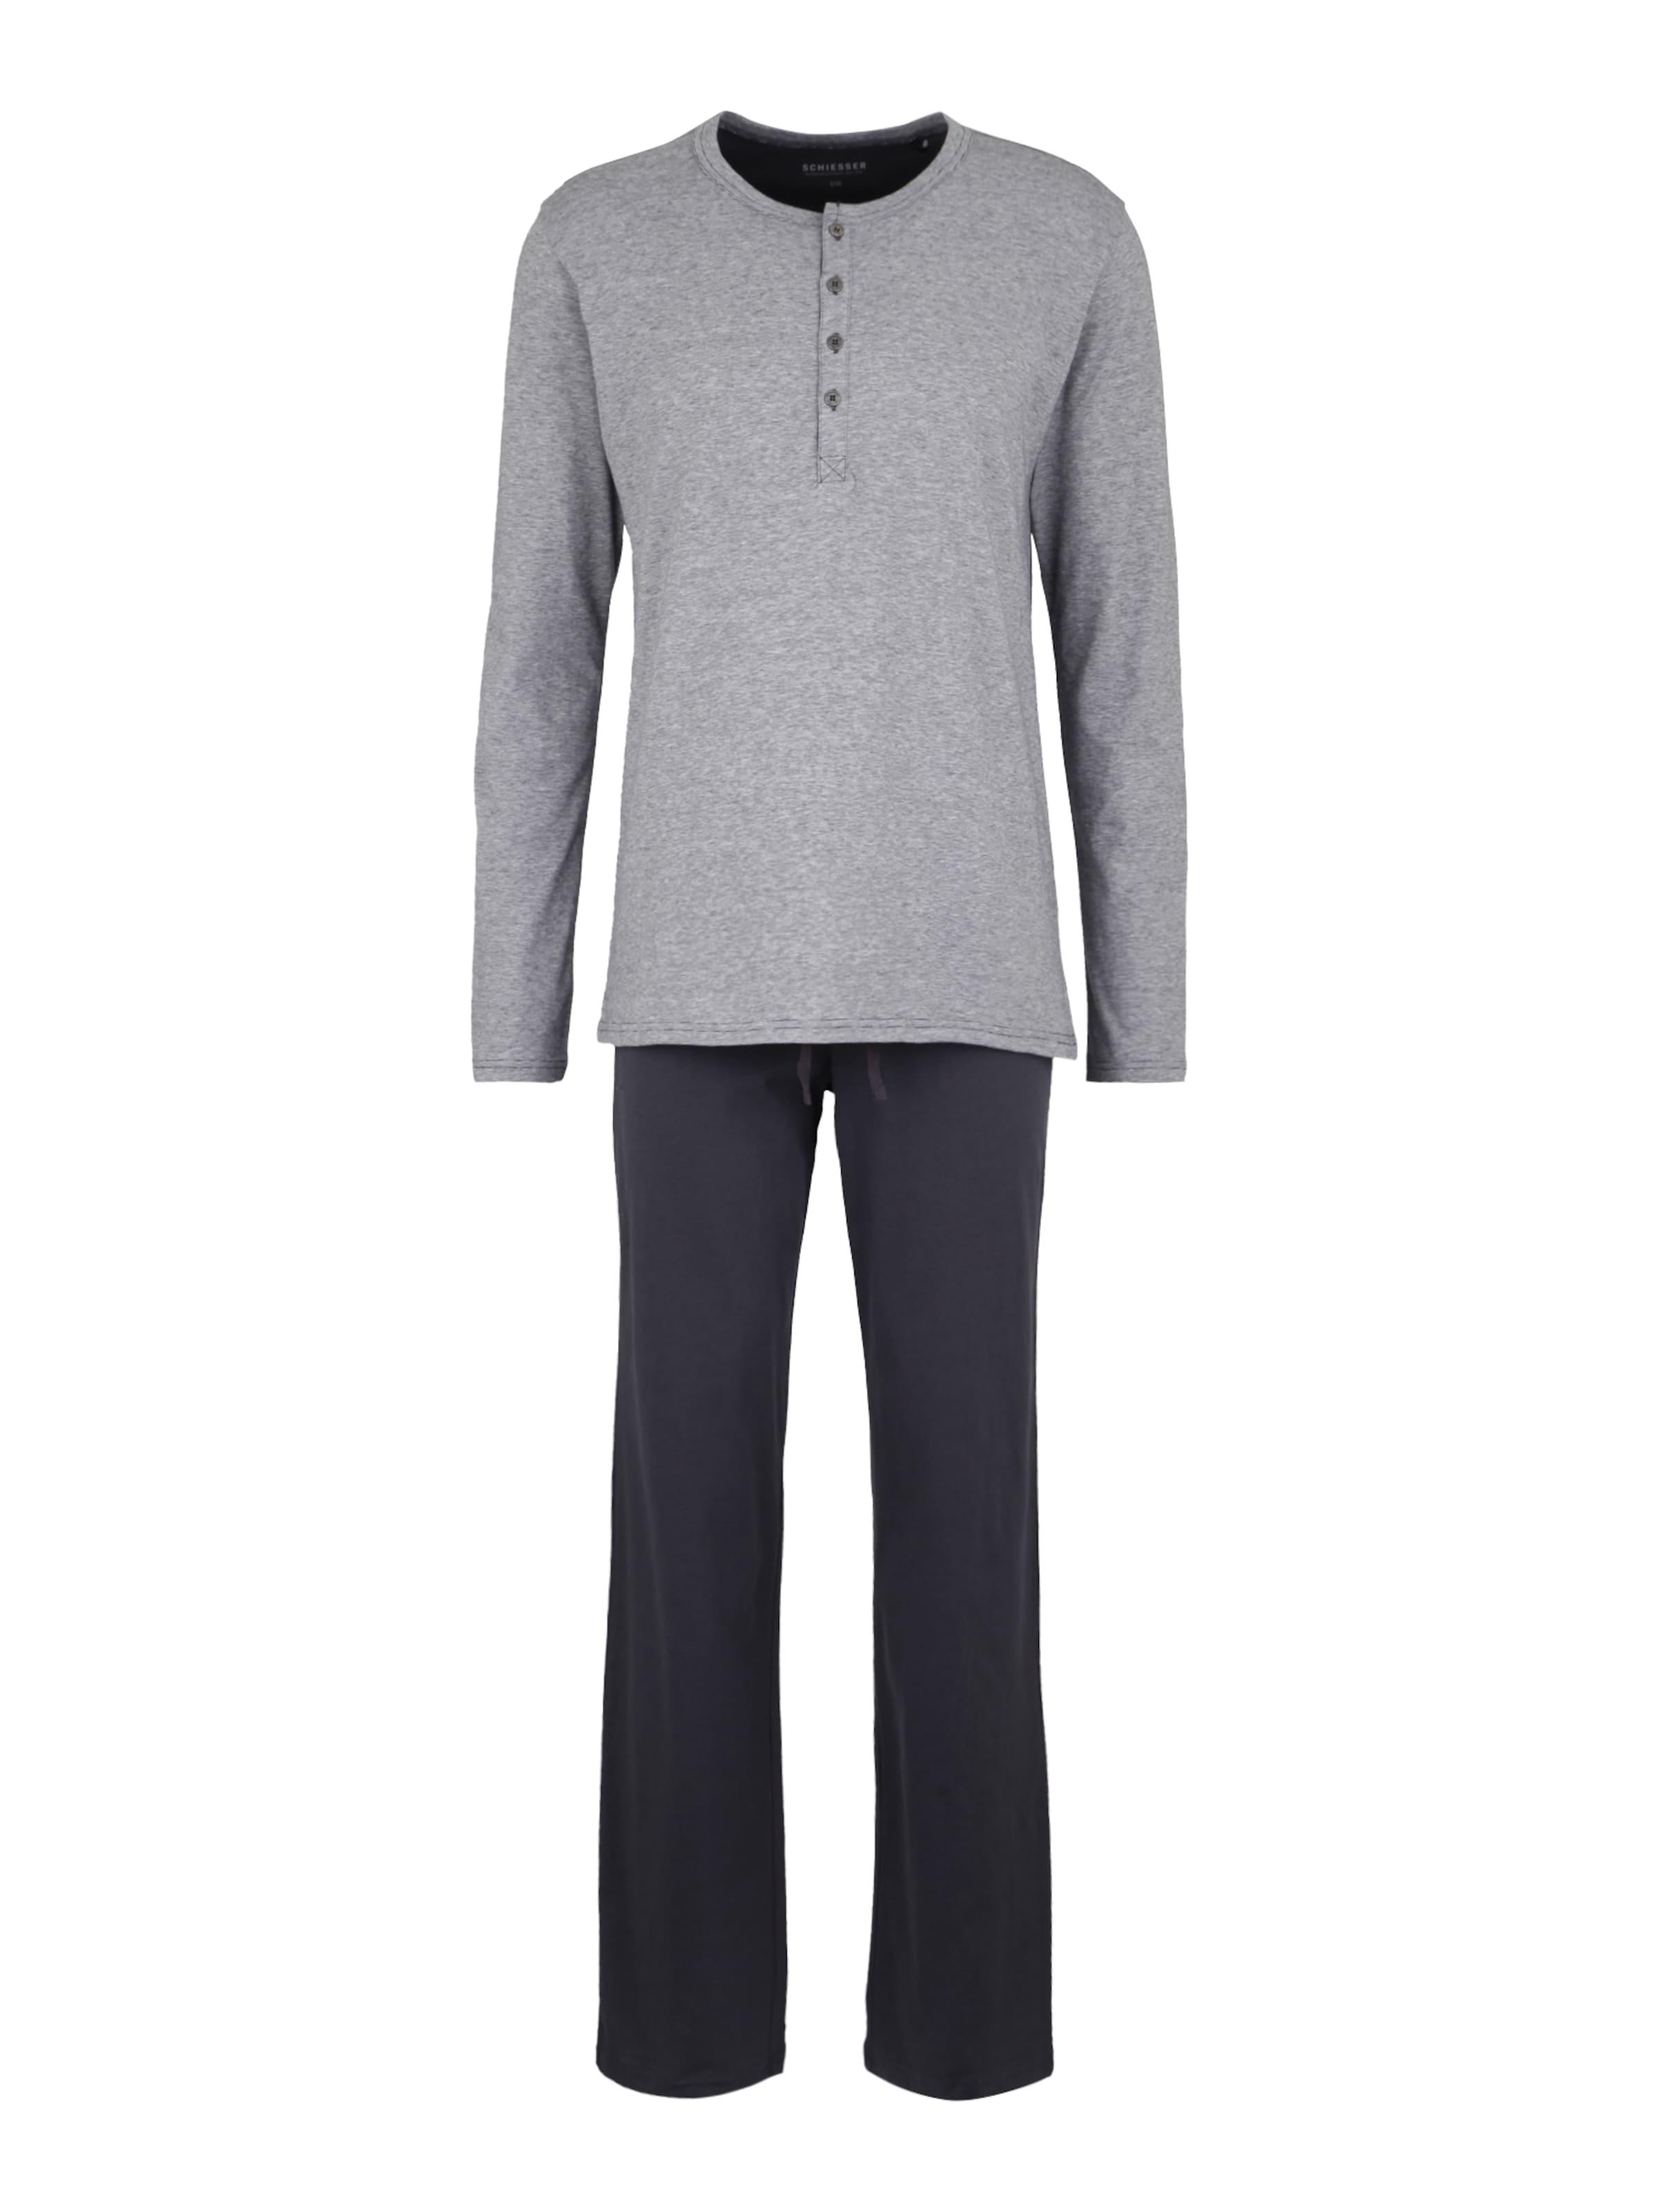 Pyjama Anthracite Schiesser En Pantalon De SzpqVMUG